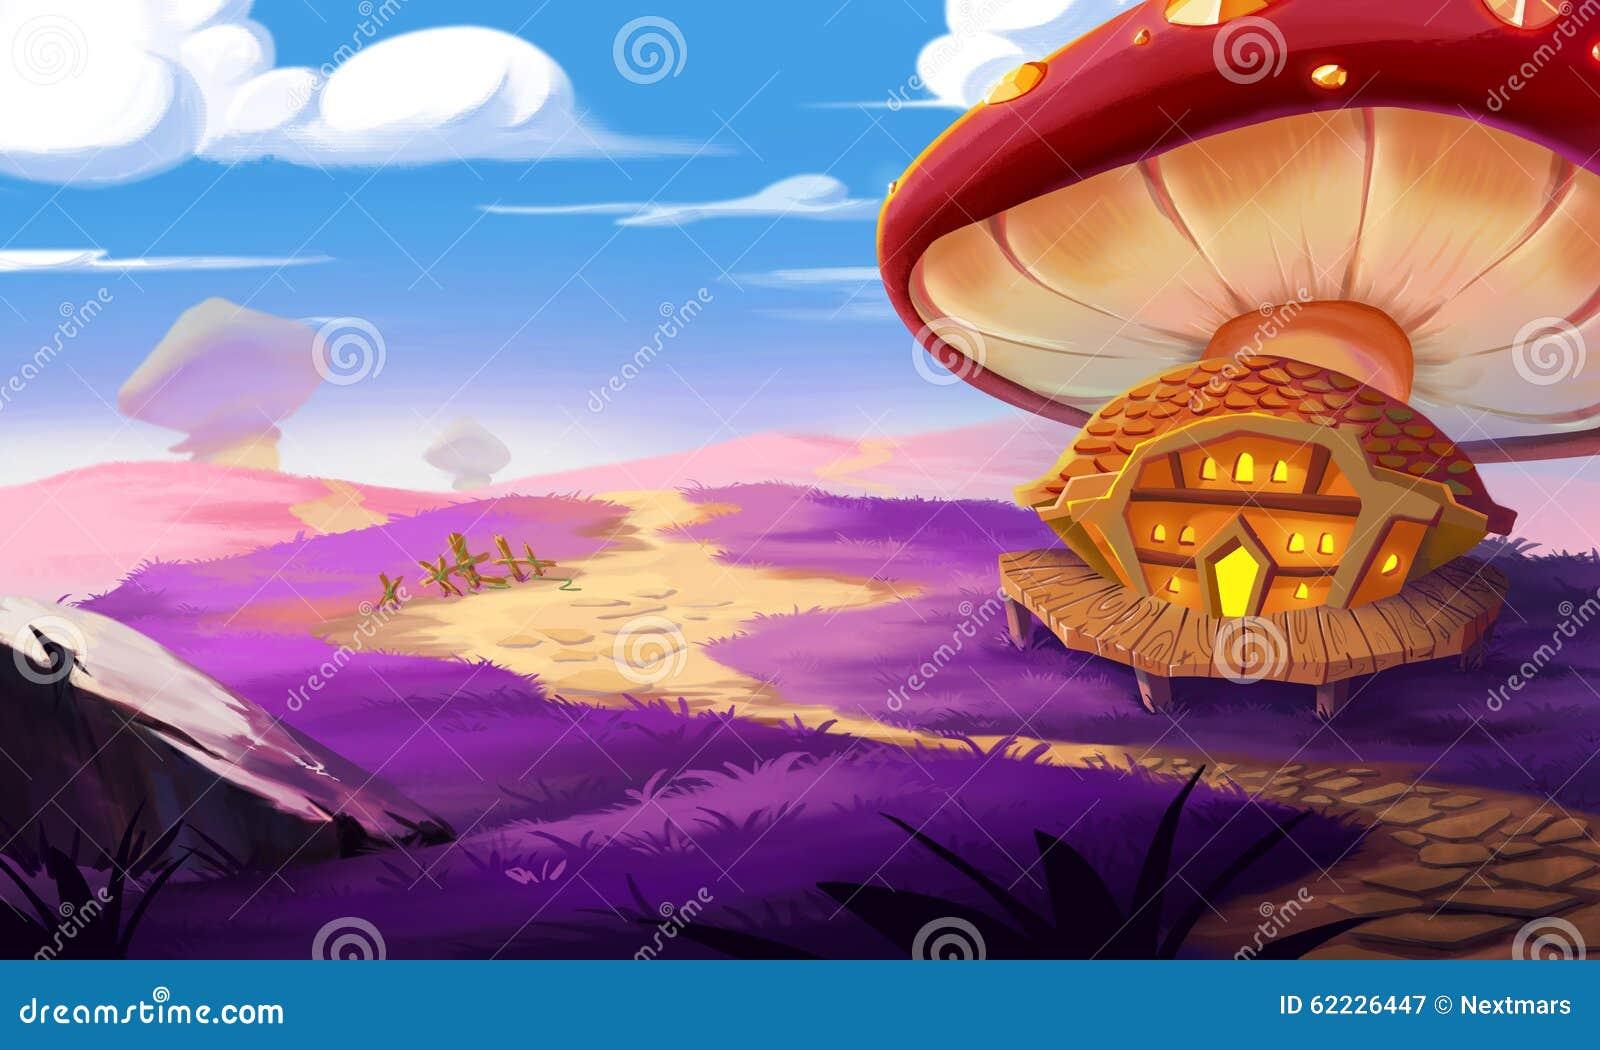 A Fantastic Land A Huge Mushroom And A House Built Near